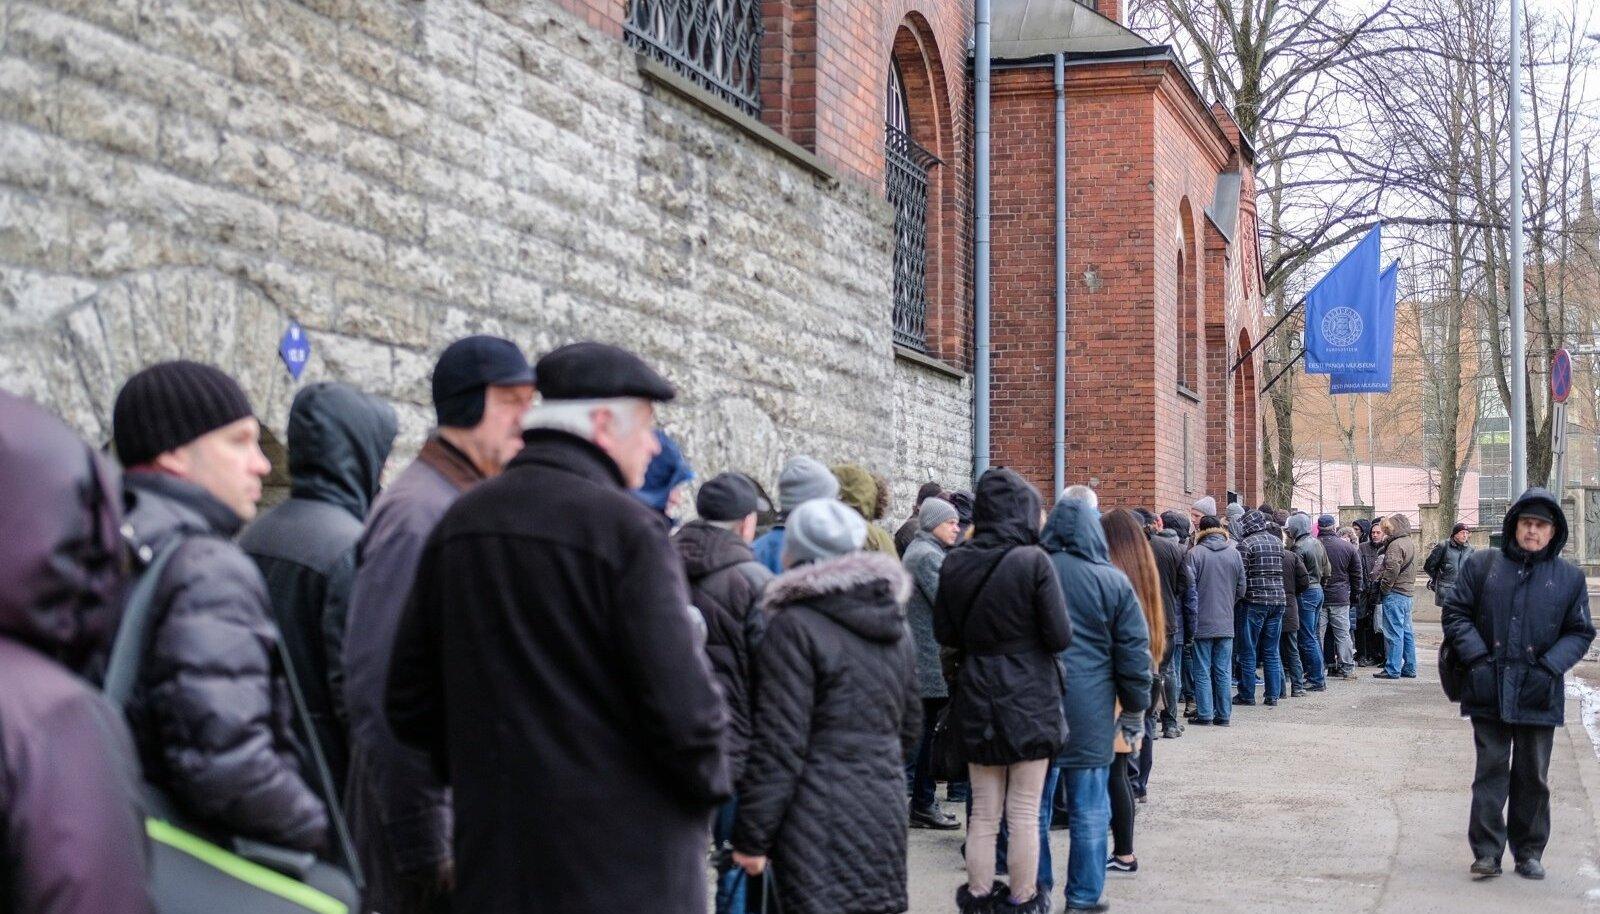 Eesti Panga muuseumis tutvustati 12.02.2017 PyeongChangi taliolümpia meenemünti ja marki.